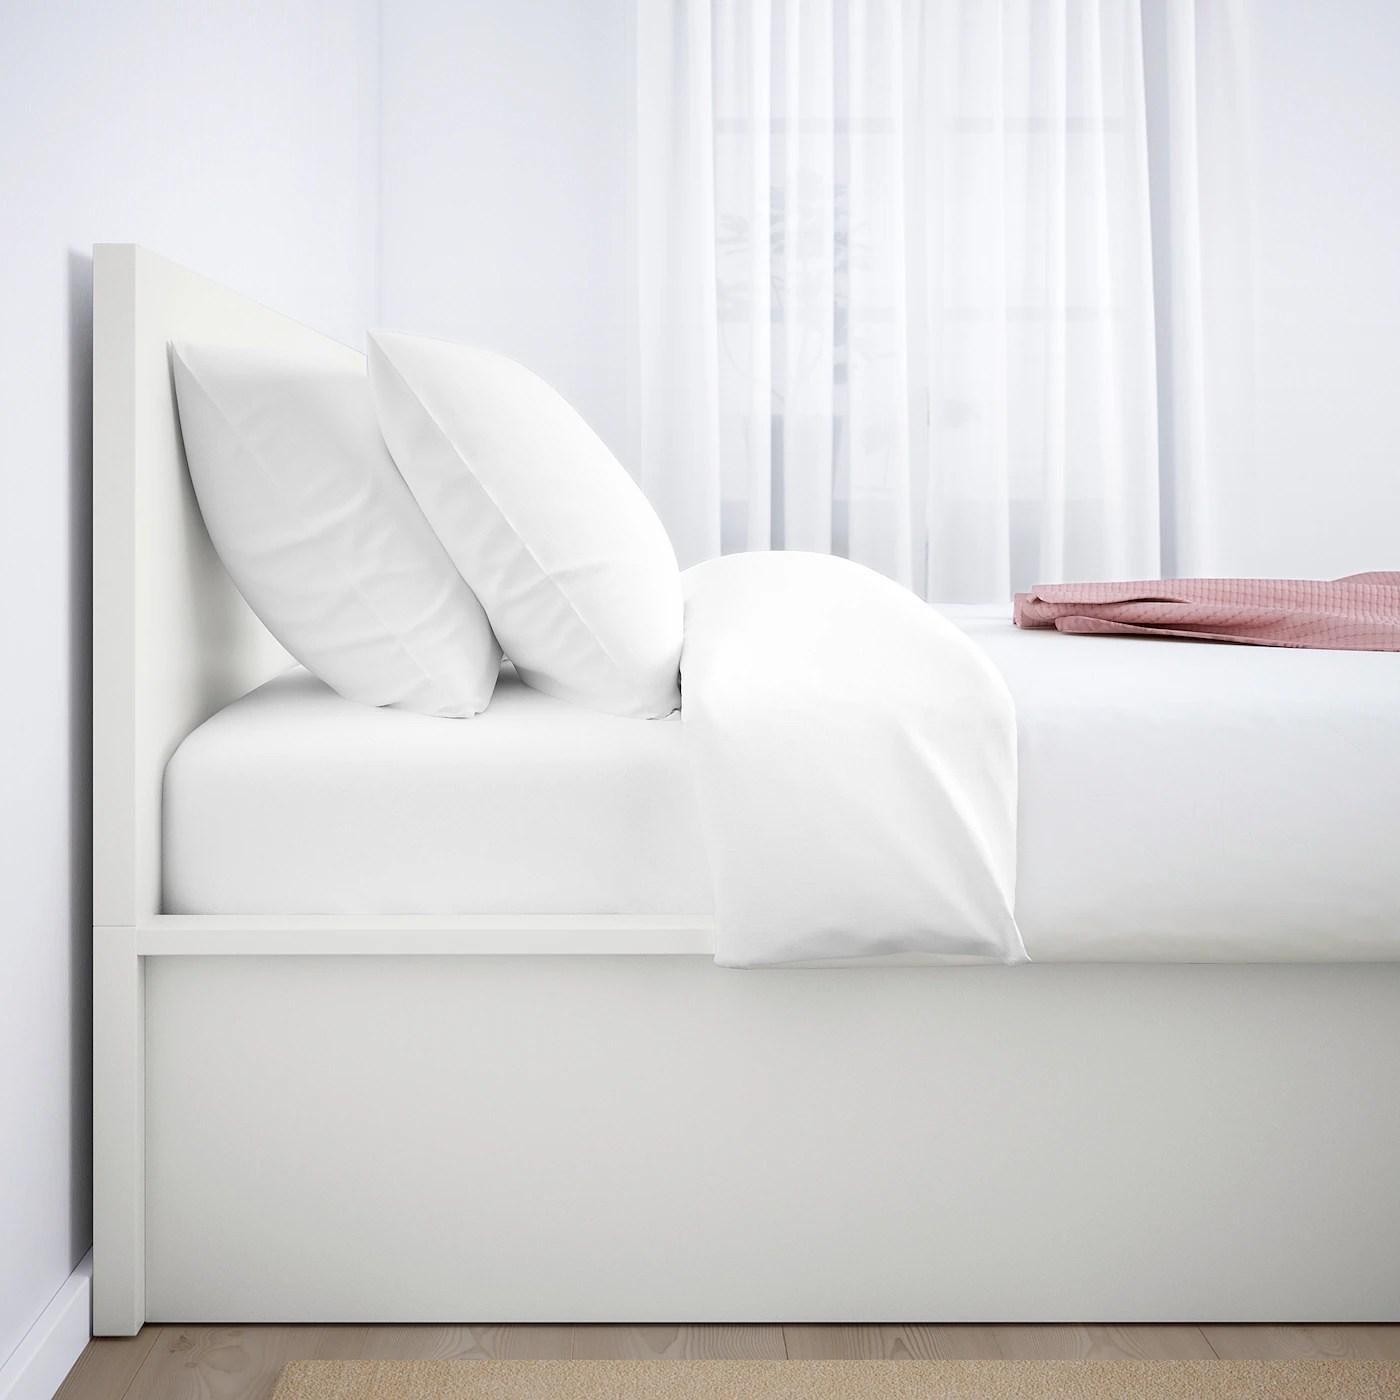 Bett 12X12 Mit Bettkasten Ikea  Stauraum Bett 12x12 Ikea ...